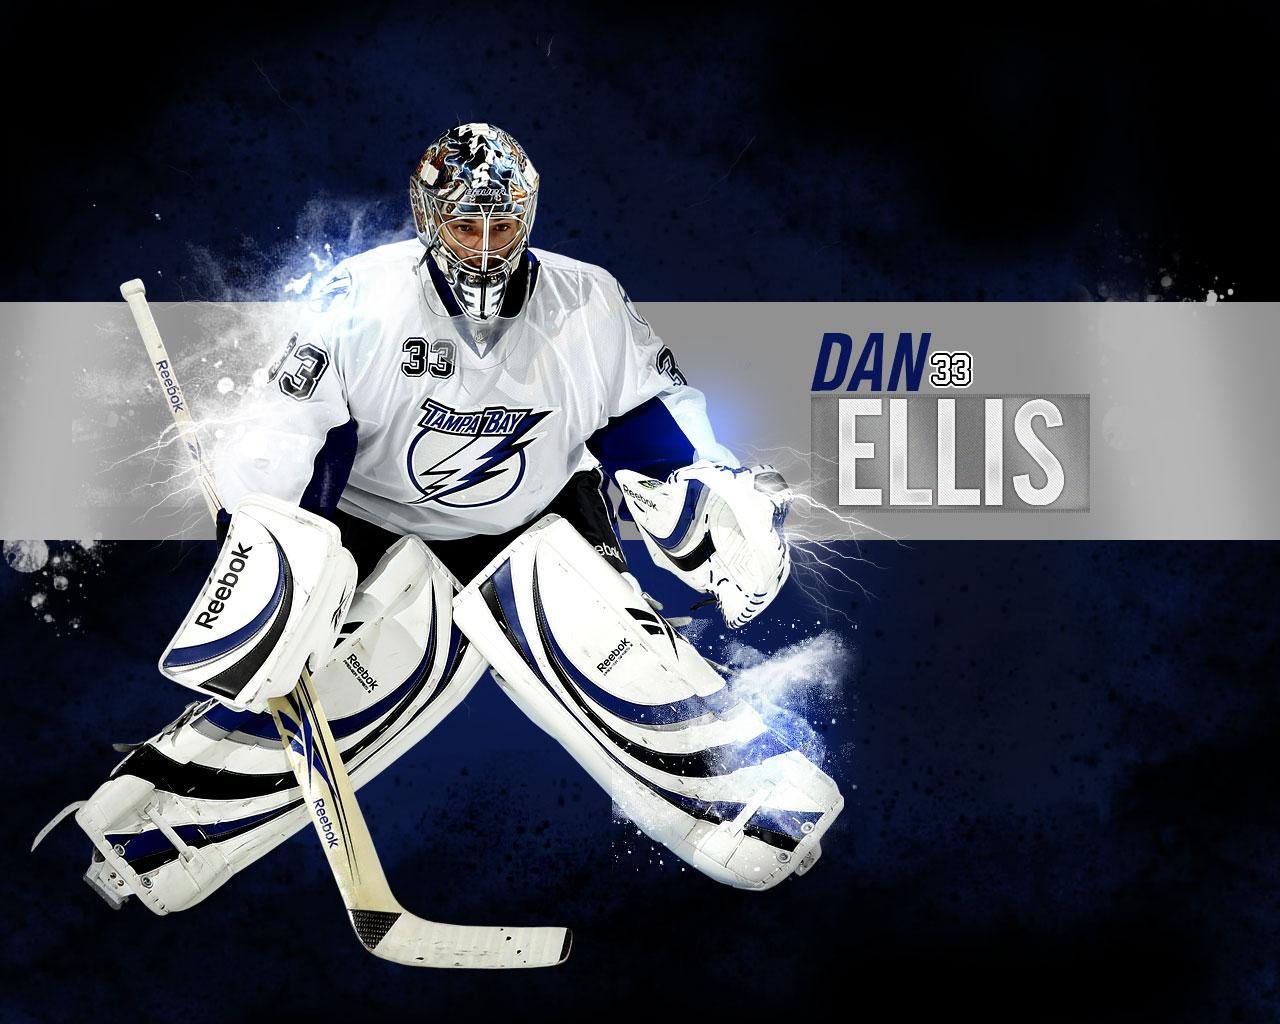 NHL Wallpapers   Dan Ellis Tampa Bay Lightning wallpaper 1280x1024